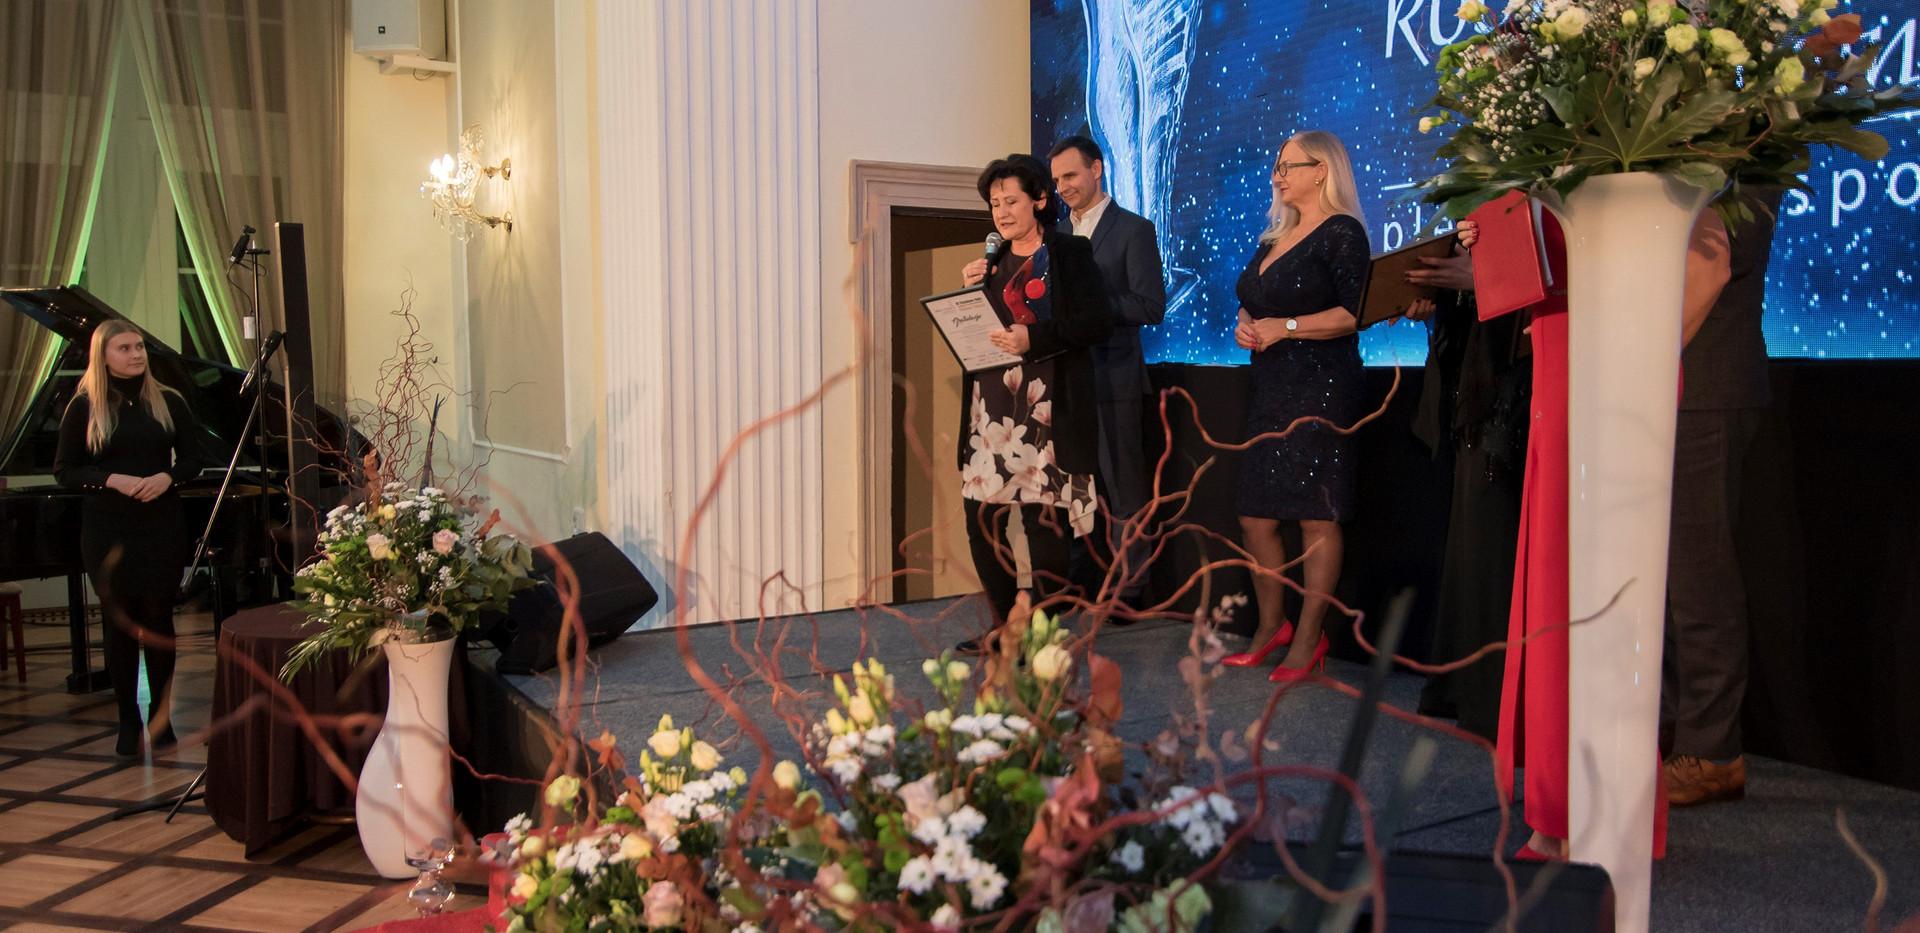 baranska MSP laureatka 2019 KT.jpg